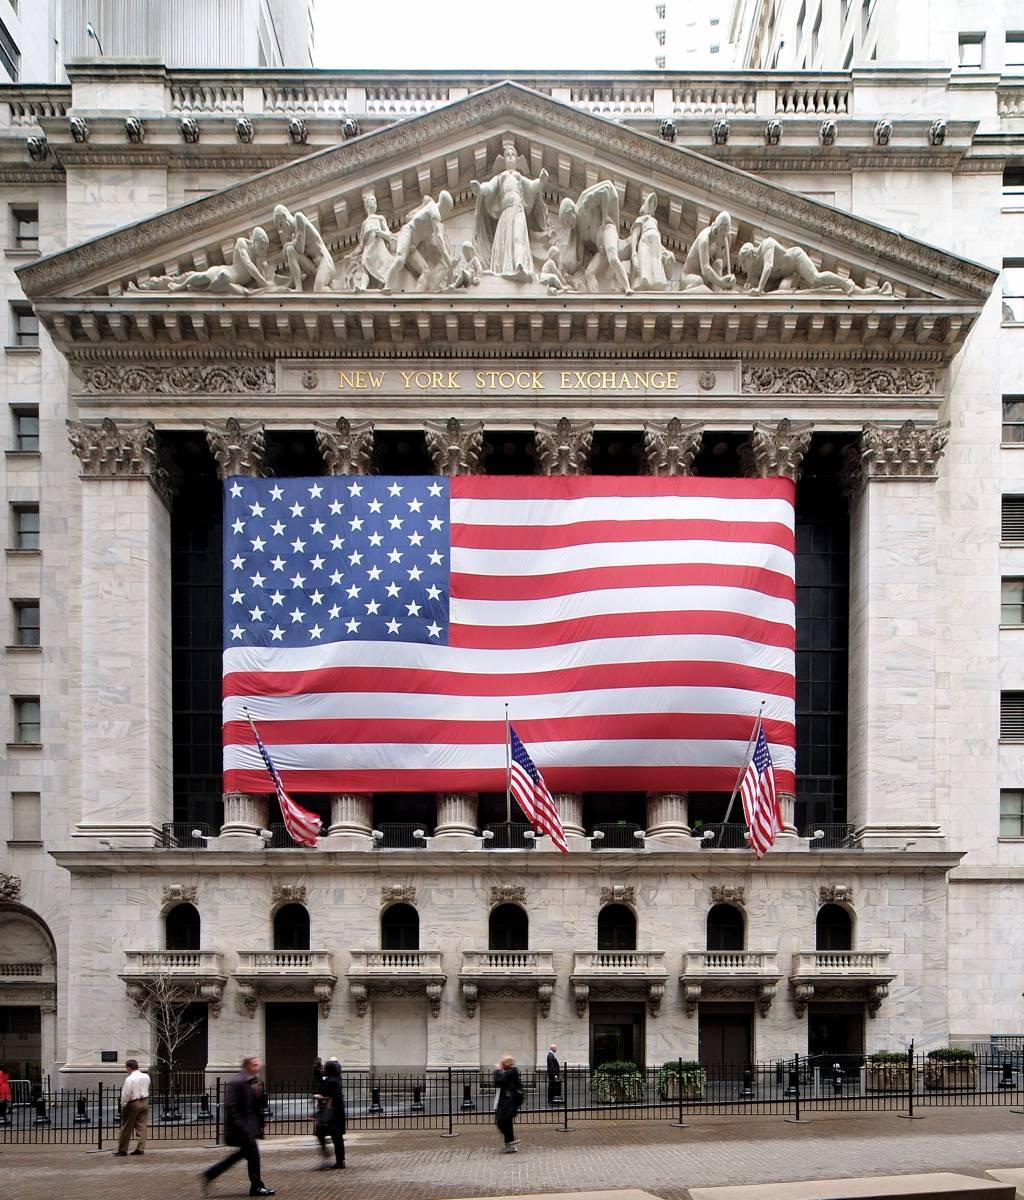 essay new york stock exchange New york stock exchange, new york, new york 234k likes the new york stock exchange helps companies raise the capital that raises the world.